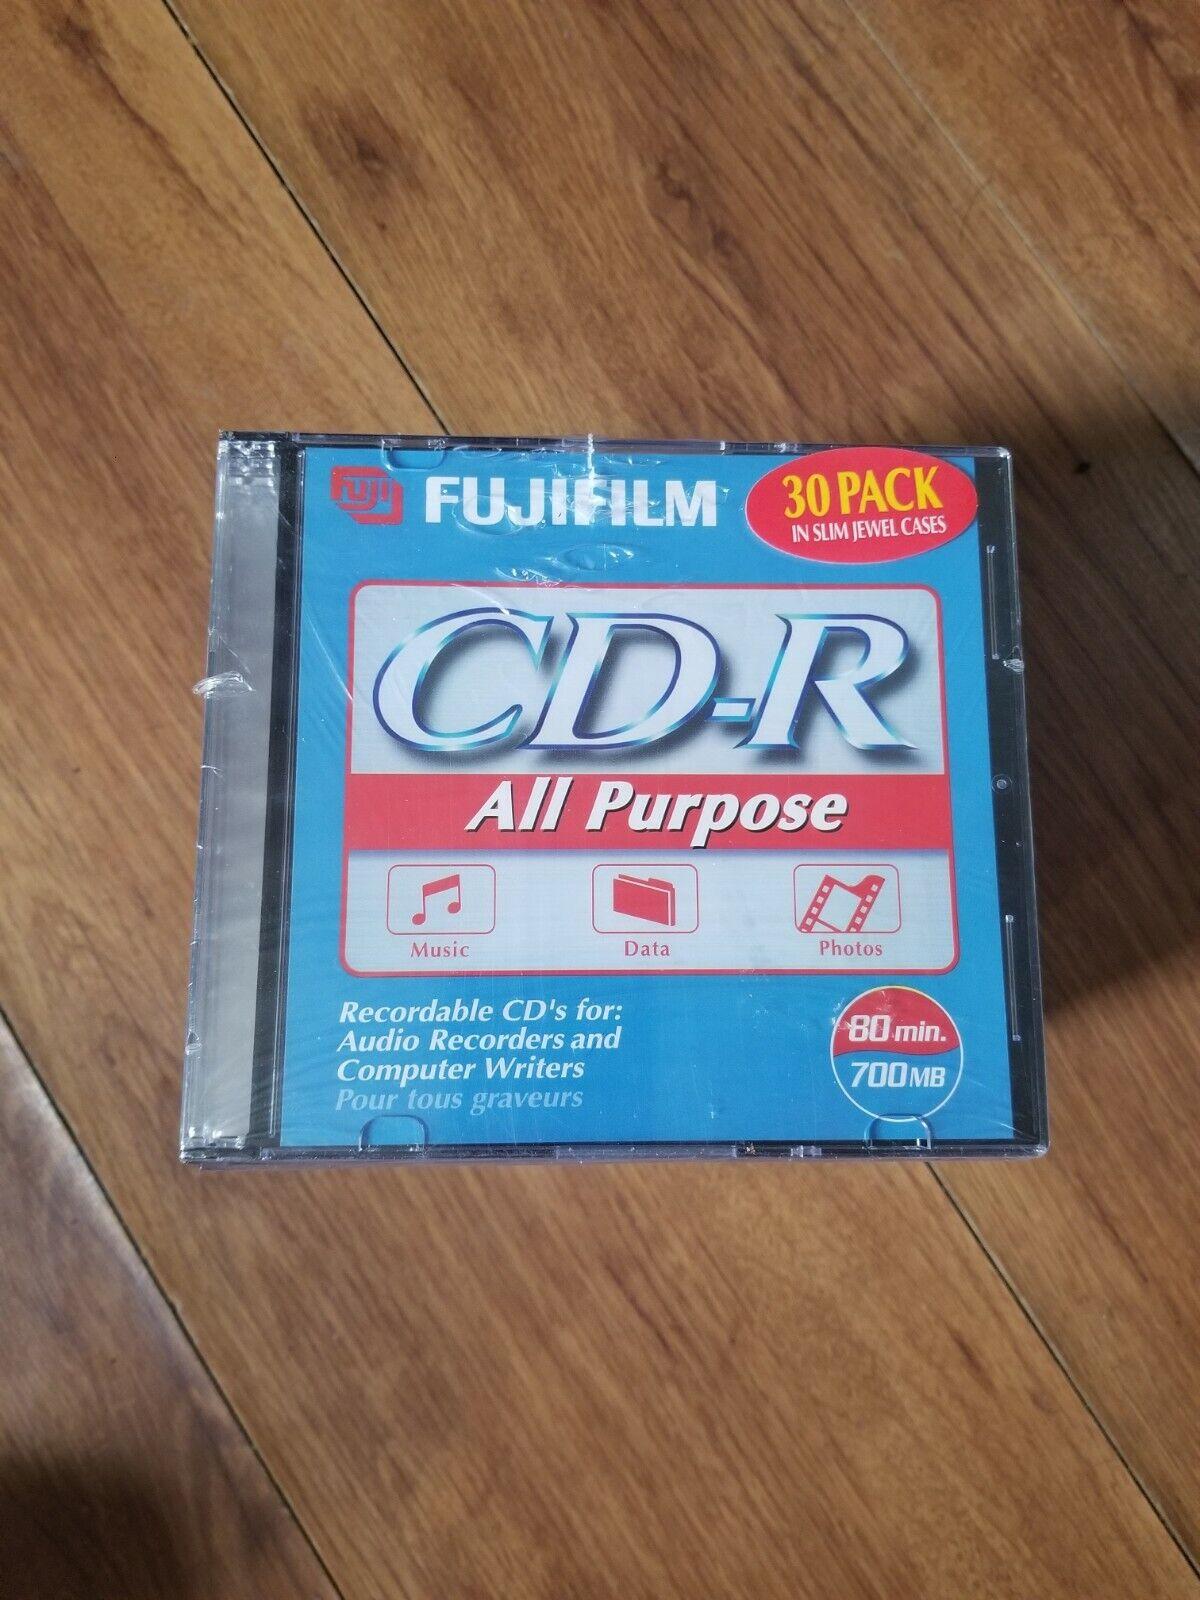 Fujifilm 30 Pack CD-R Slim Jewel Cases All Purpose 700MB 80 Min Data Music Photo